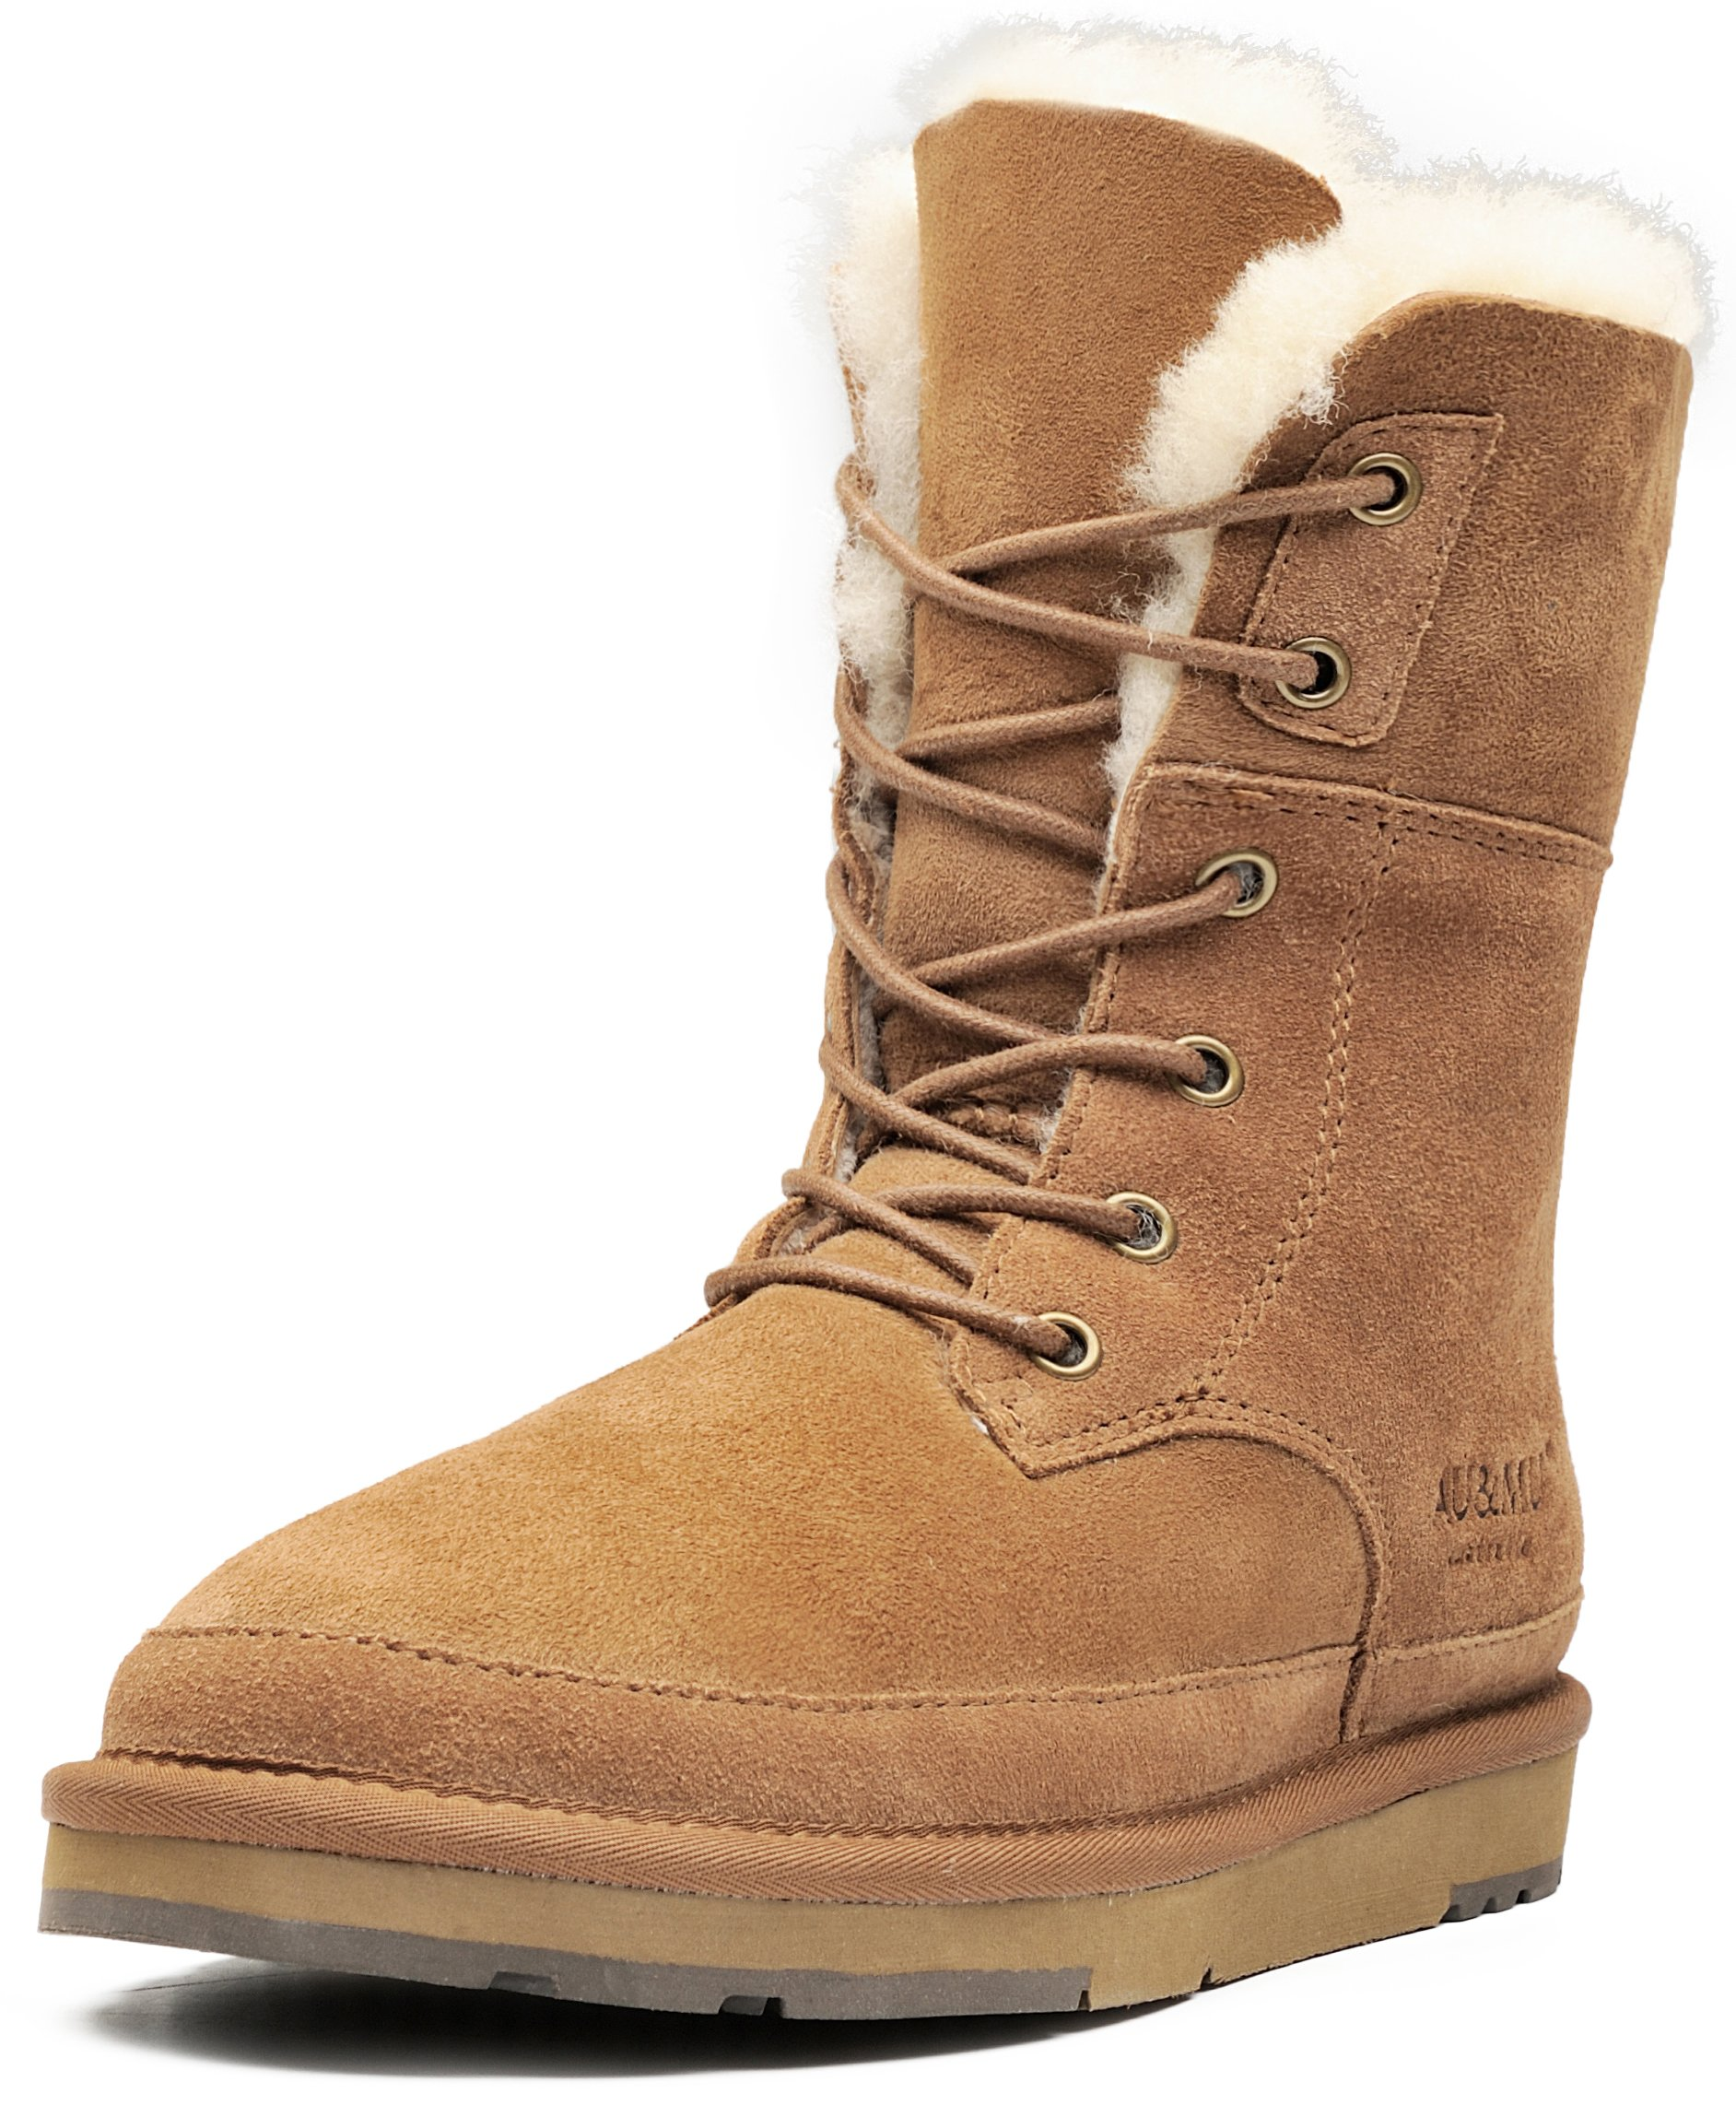 Aumu Womens Leather Sheepskin Classic Lace up Mid Calf Flat Fur Winter Snow Boot Chestnut Size 7 by AU&MU